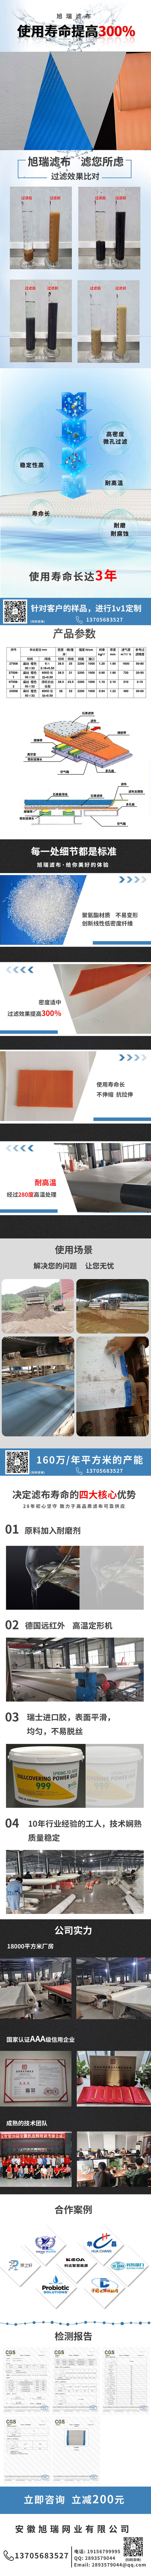 resource/images/f798af787f934f0195363b484055129a_2.jpg